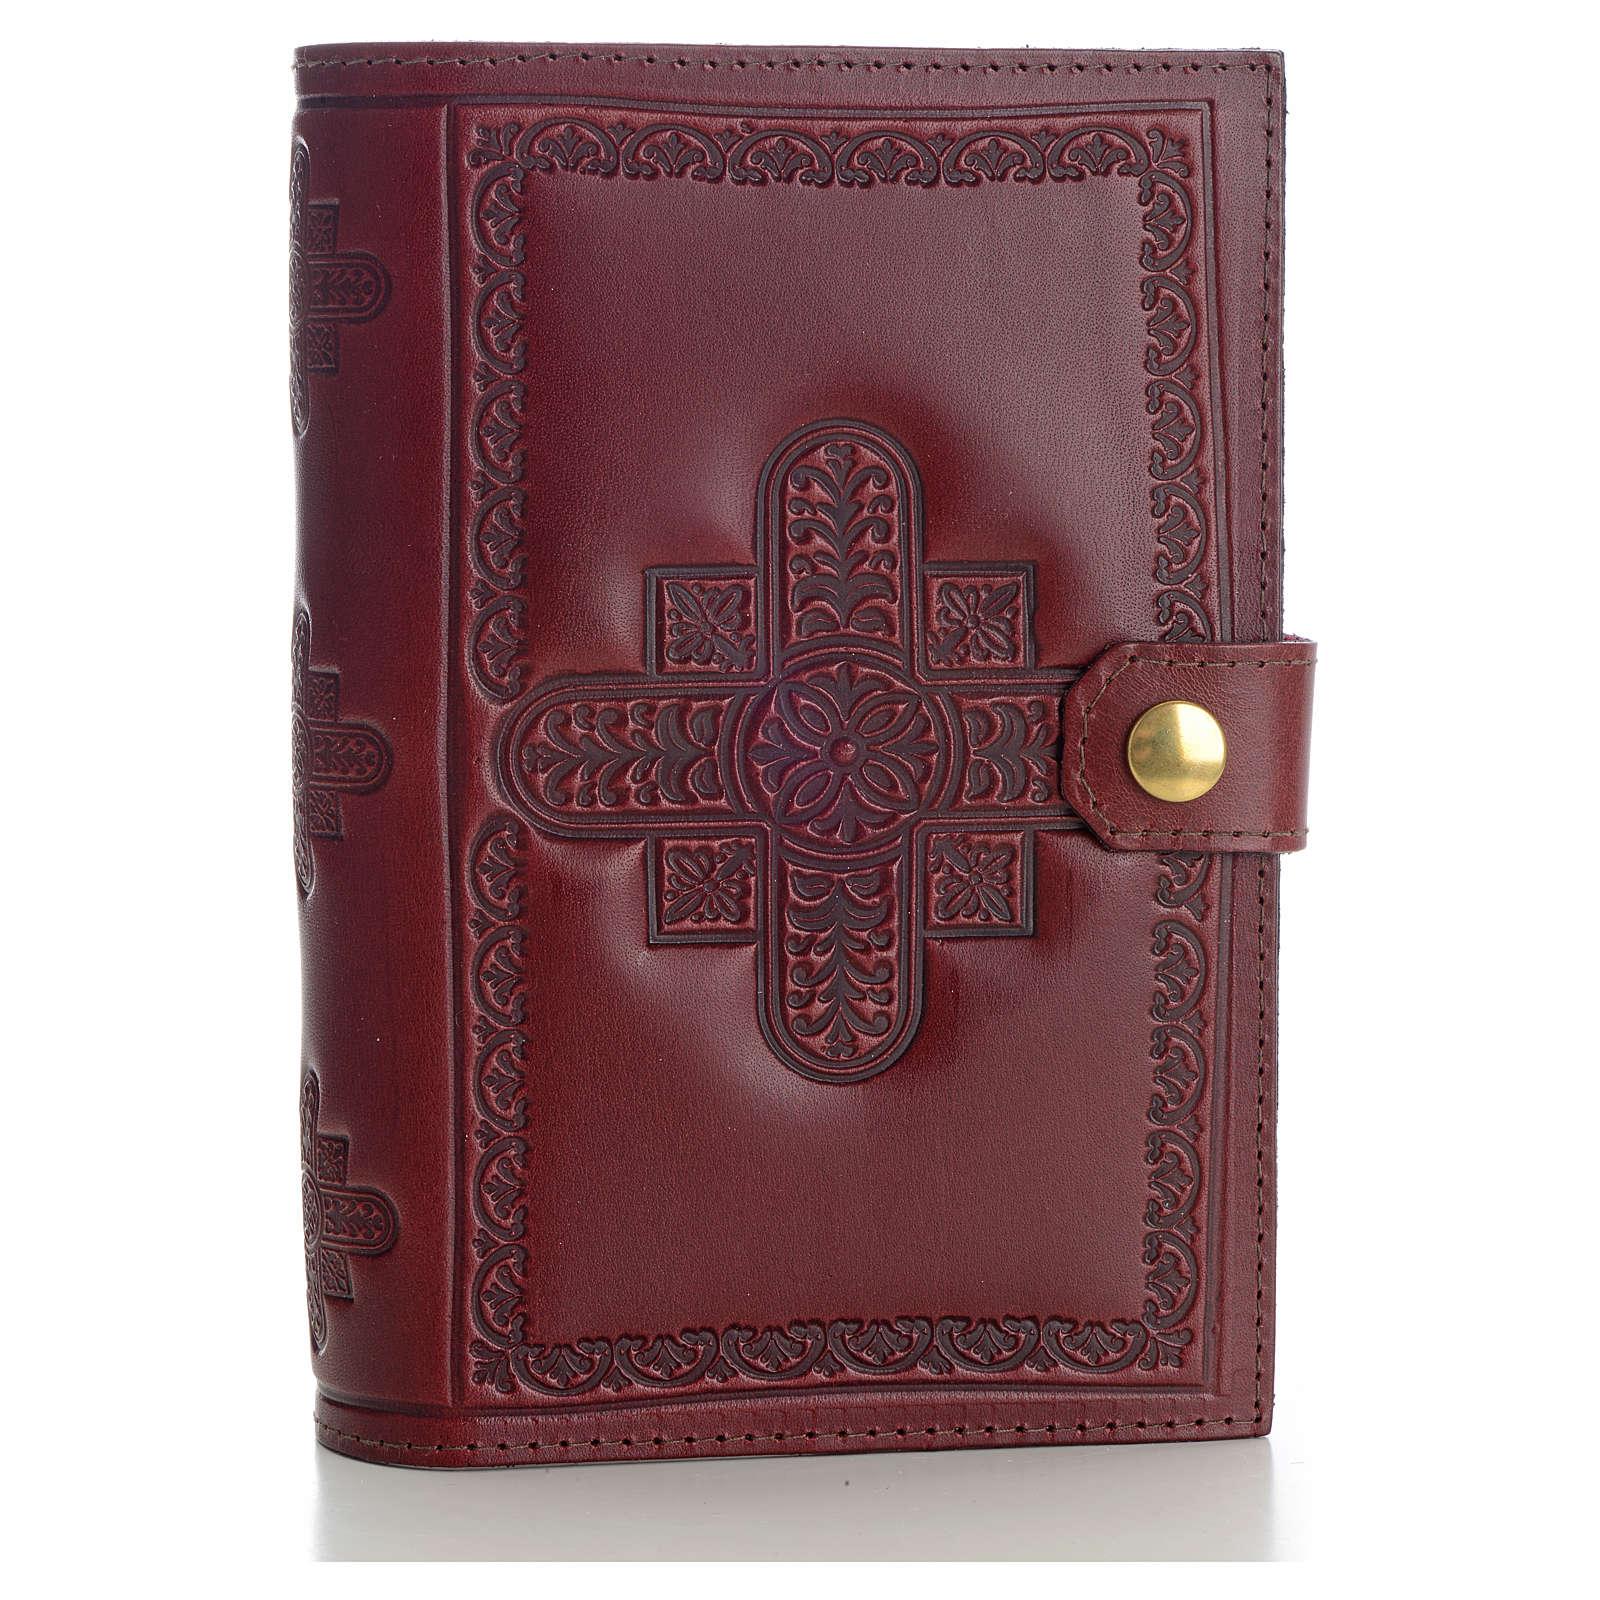 Copri liturgia 4 vol. vera pelle bordeaux croci decorate 4